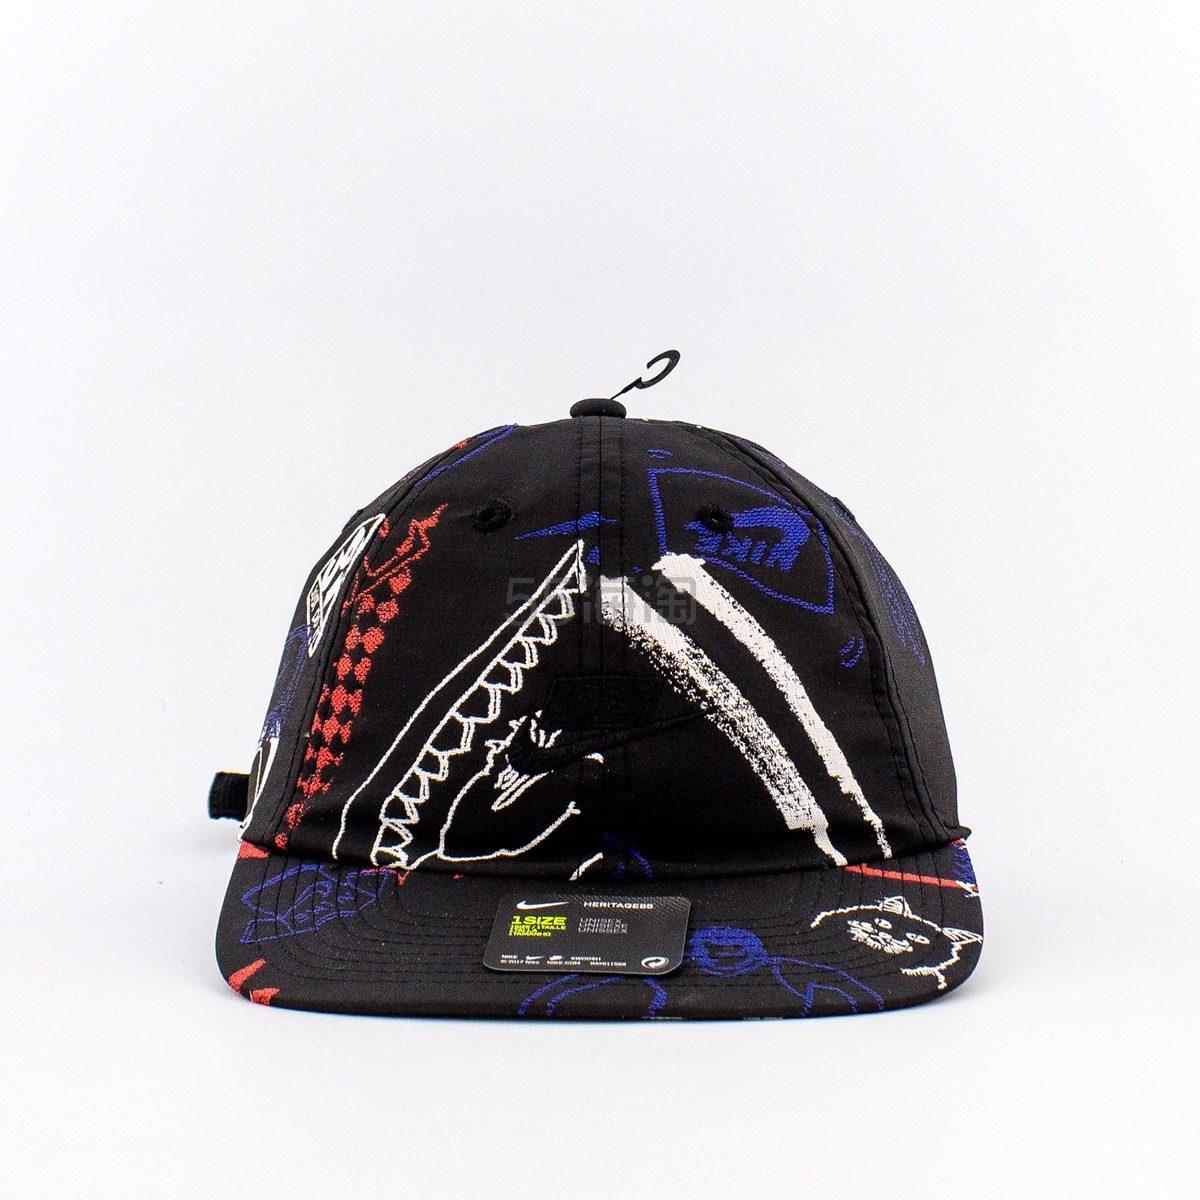 Nike 耐克 Sportswear Hat 平檐帽